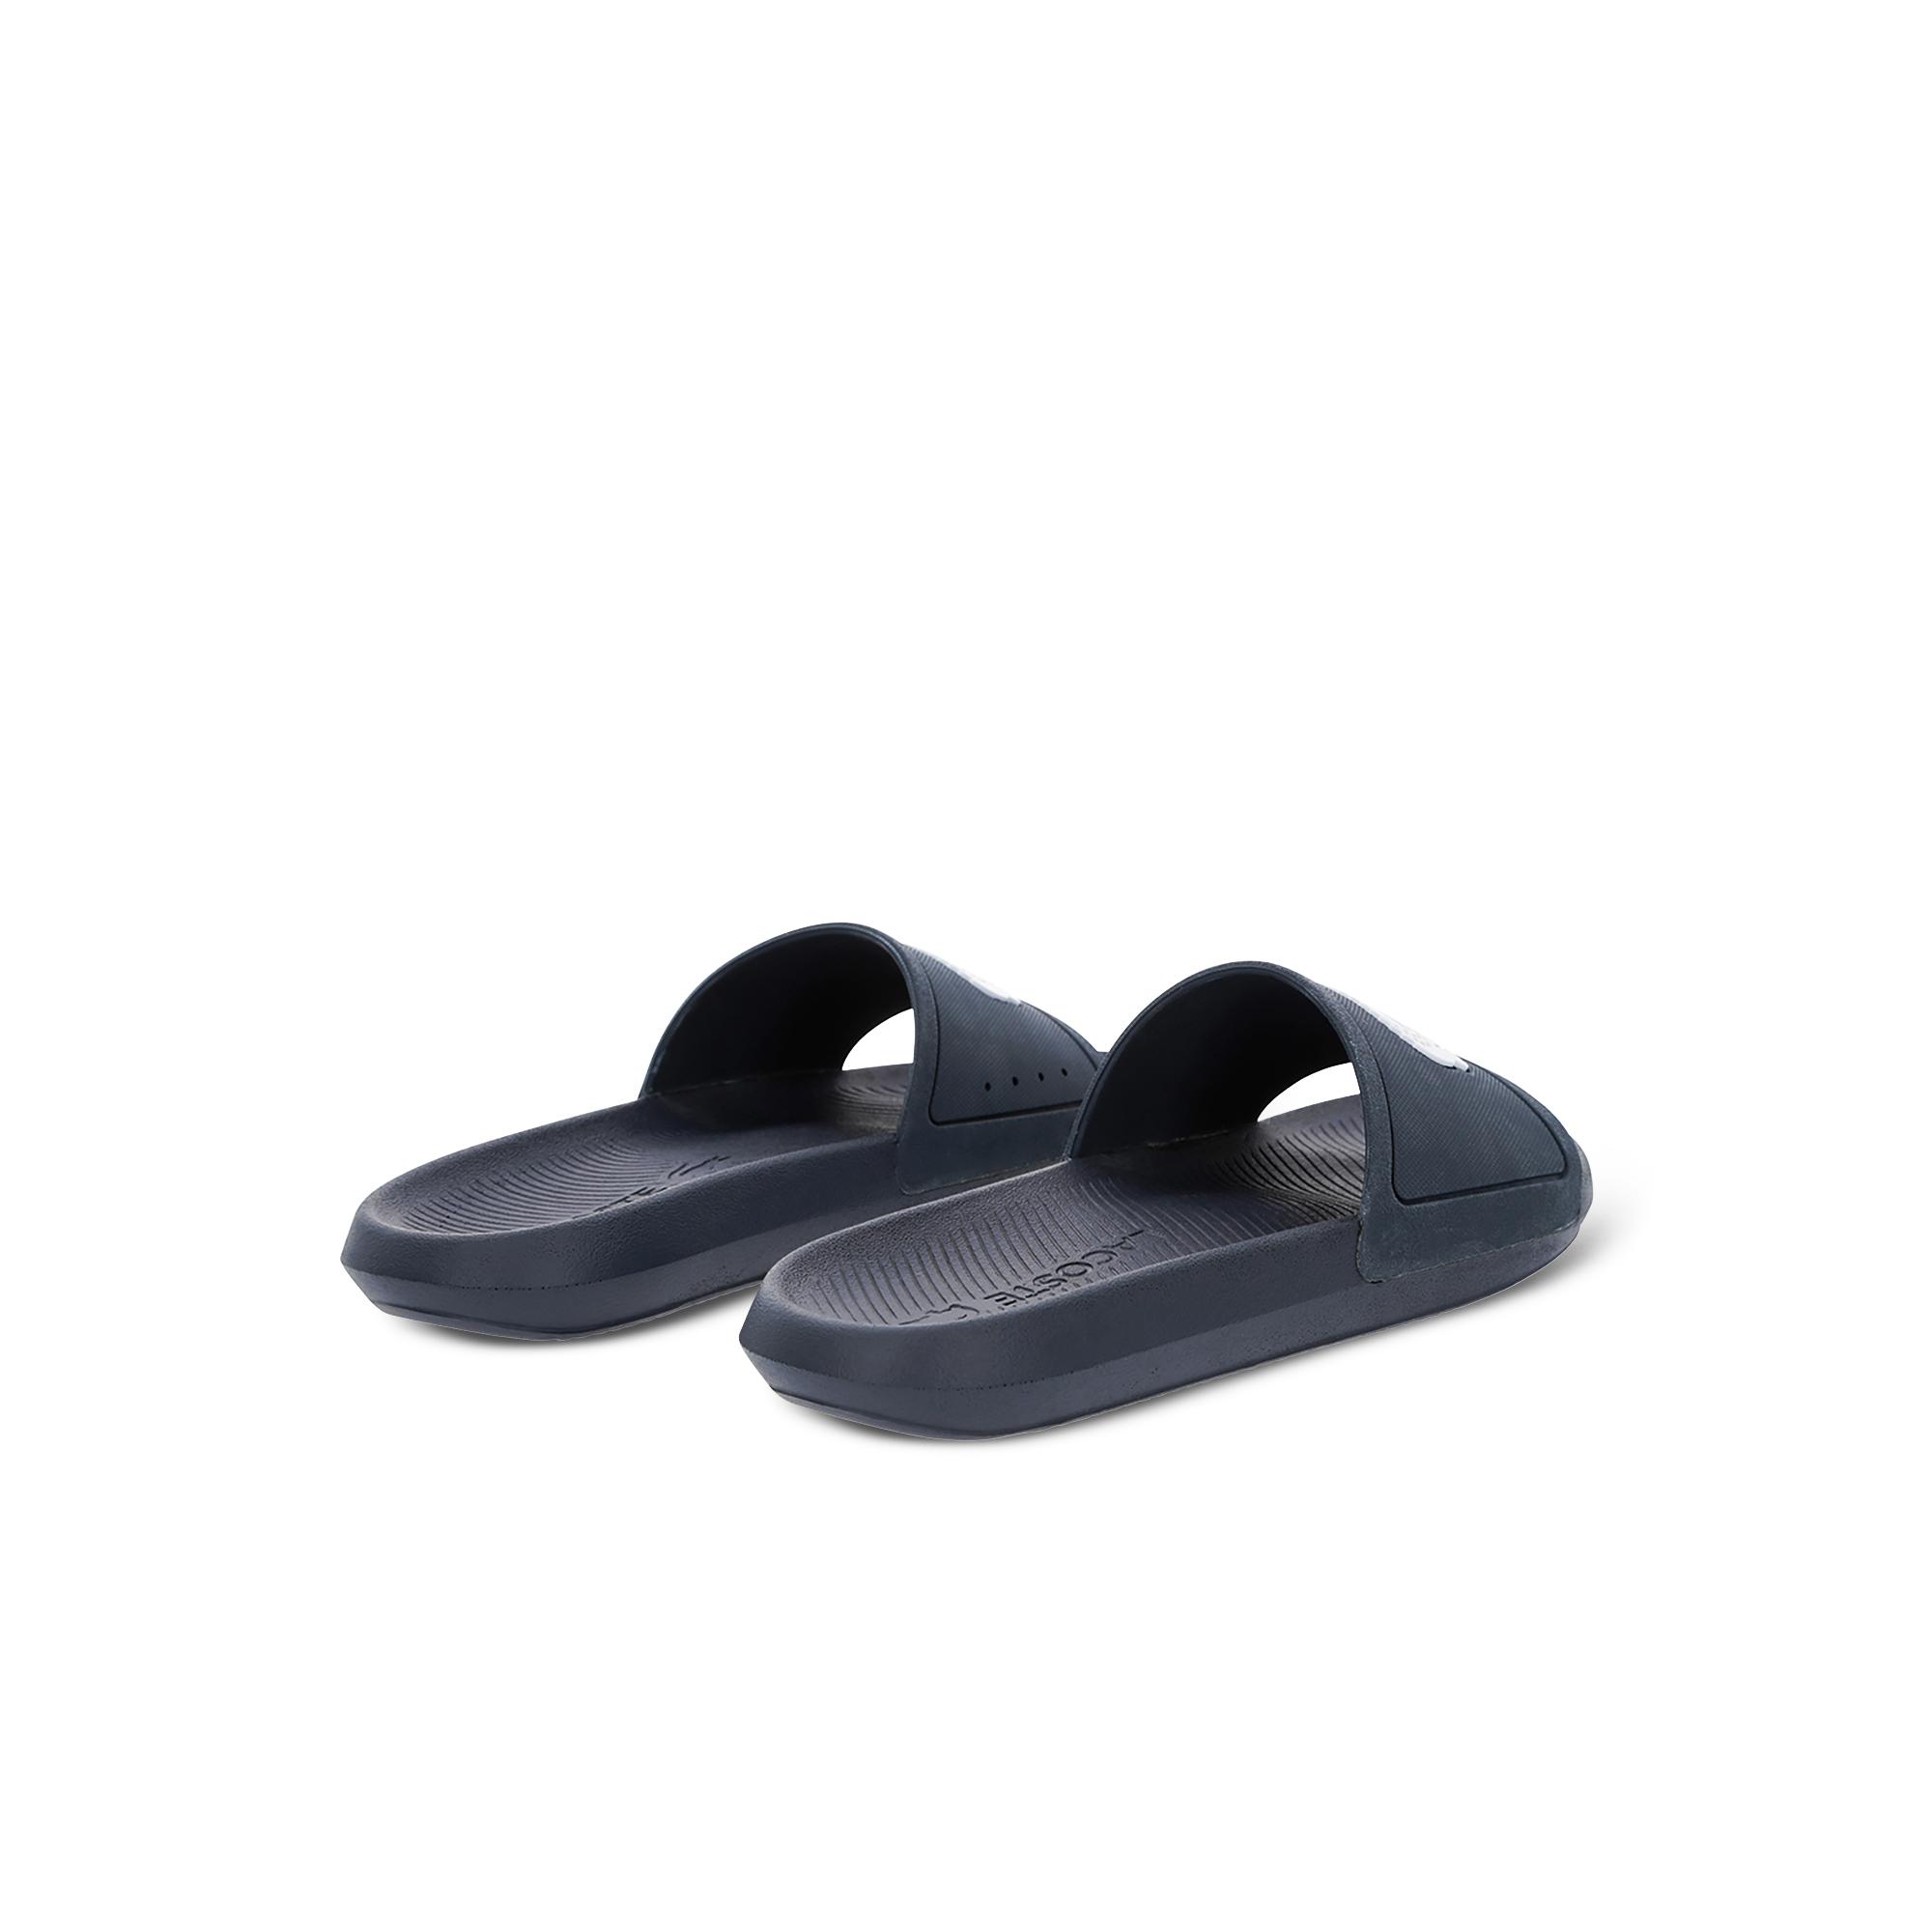 Lacoste Men's Croco Water-Repellent Synthetic Slides